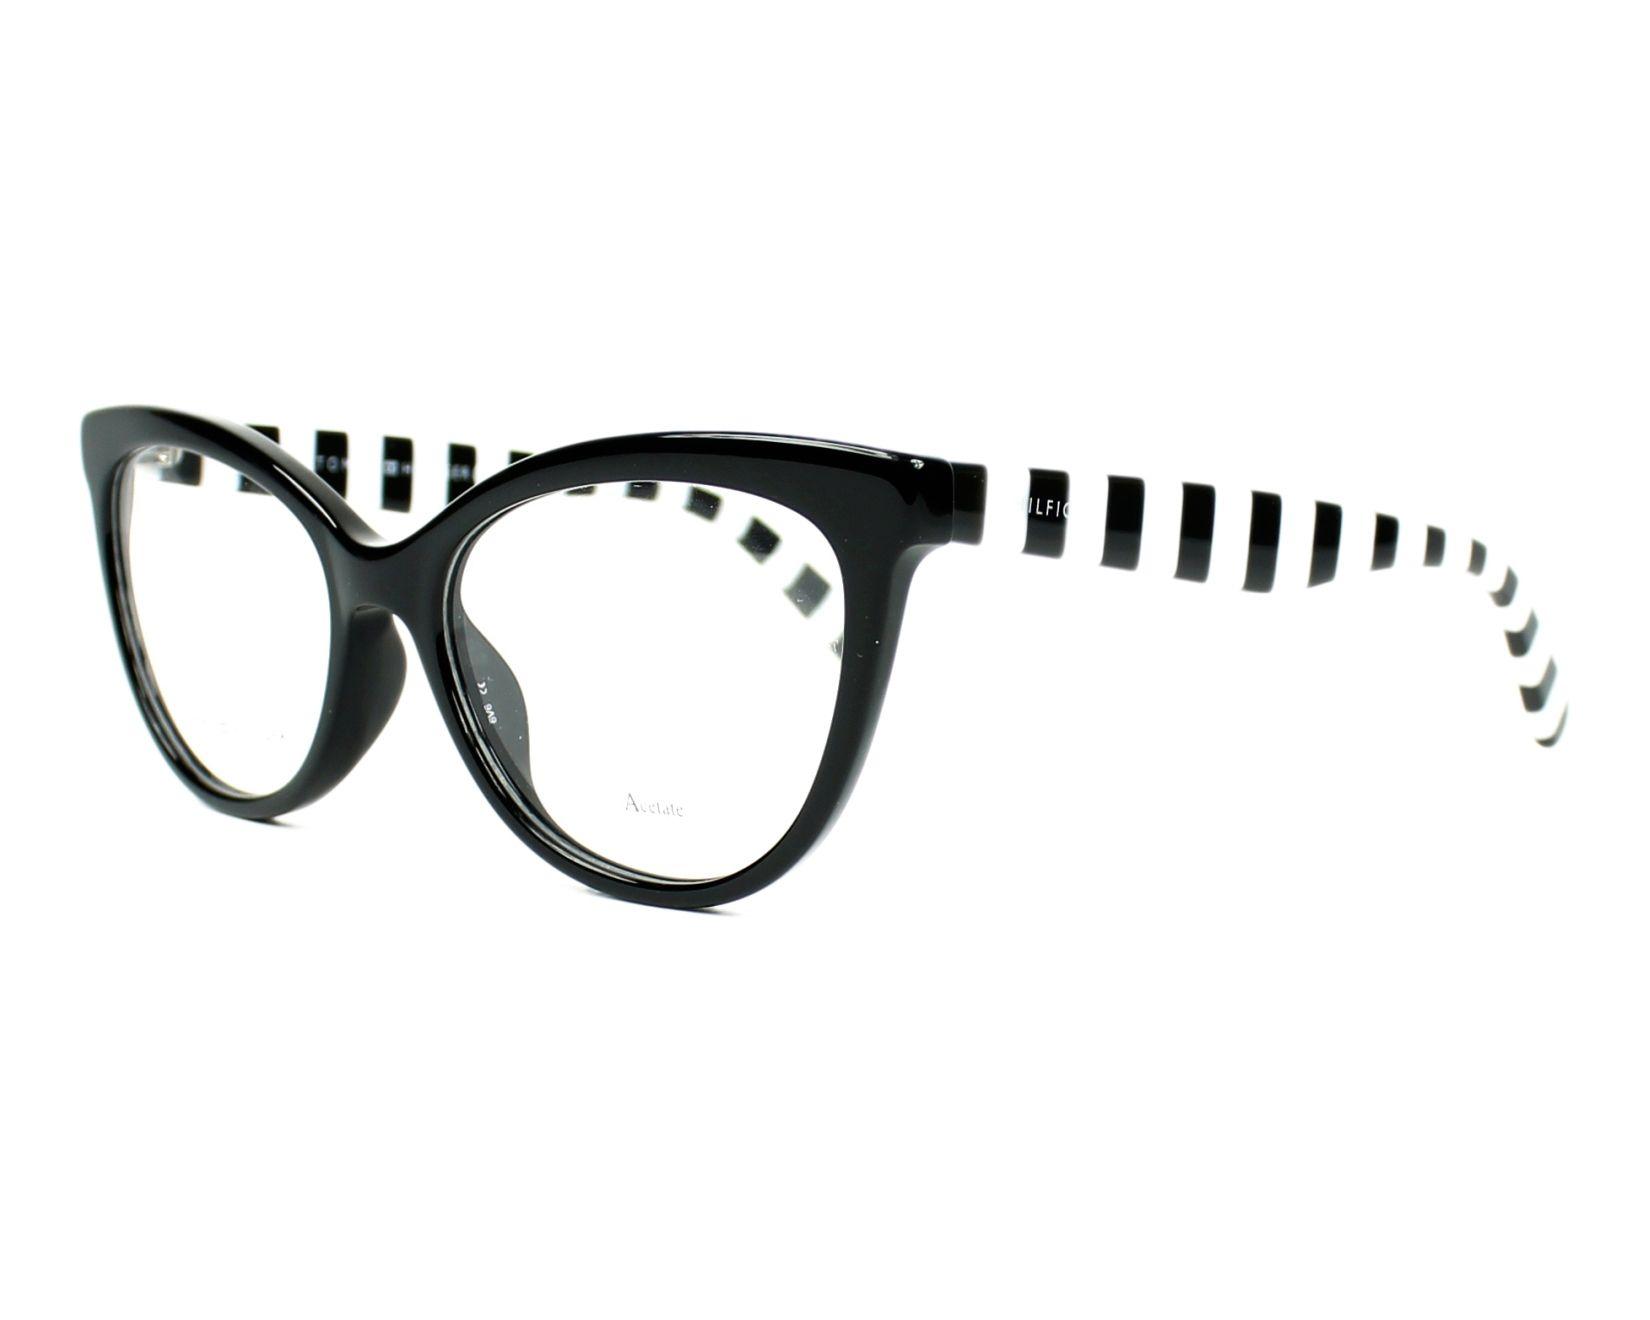 5c402e072eac eyeglasses Tommy Hilfiger TH-1481 807 - Black profile view